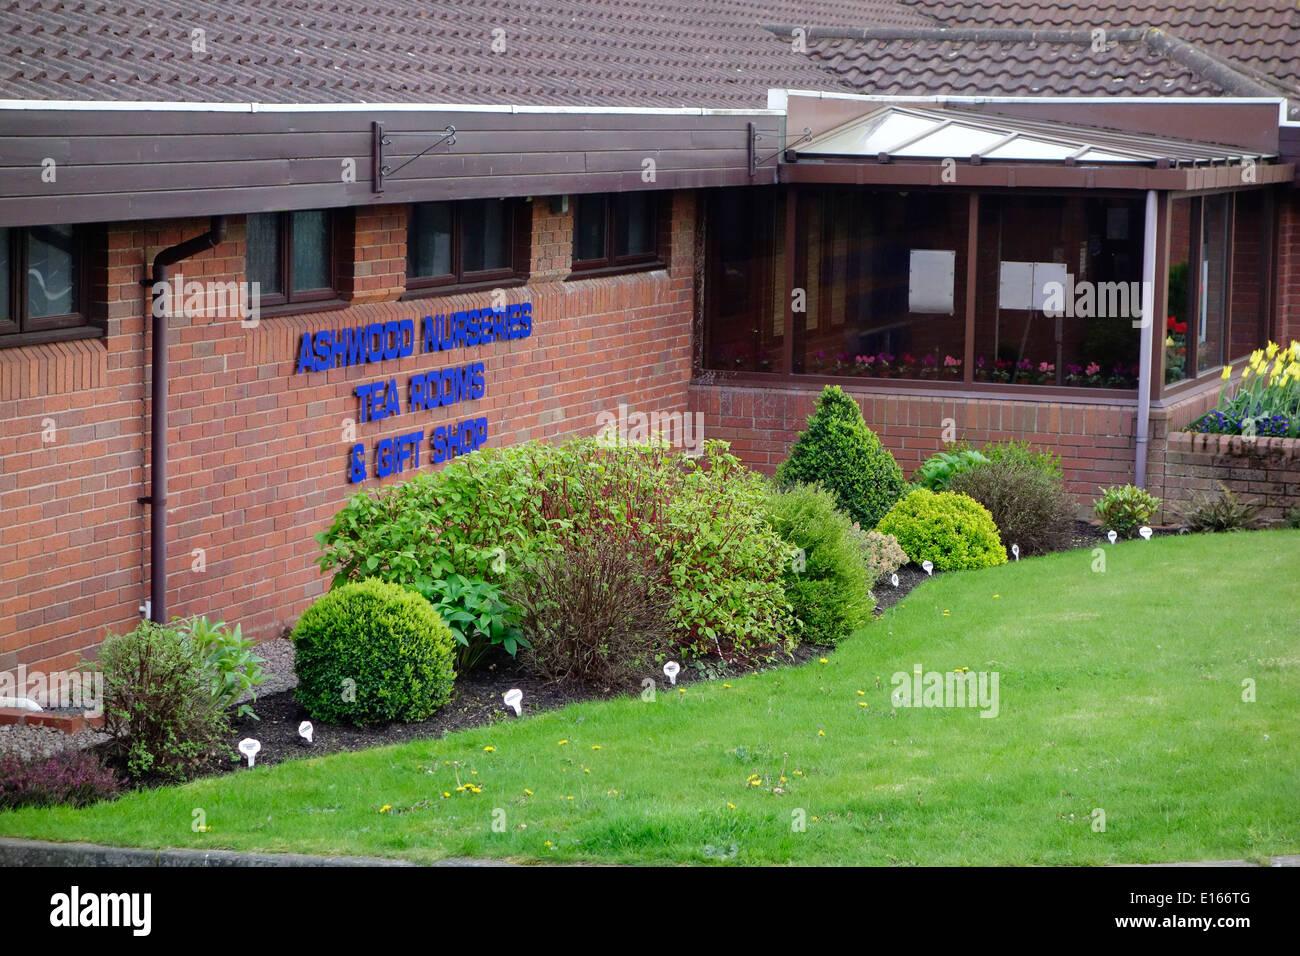 Ashwood Nurseries Tea Rooms & Gift Shop, Ashwwod, Staffordshire, England, UK Stock Photo